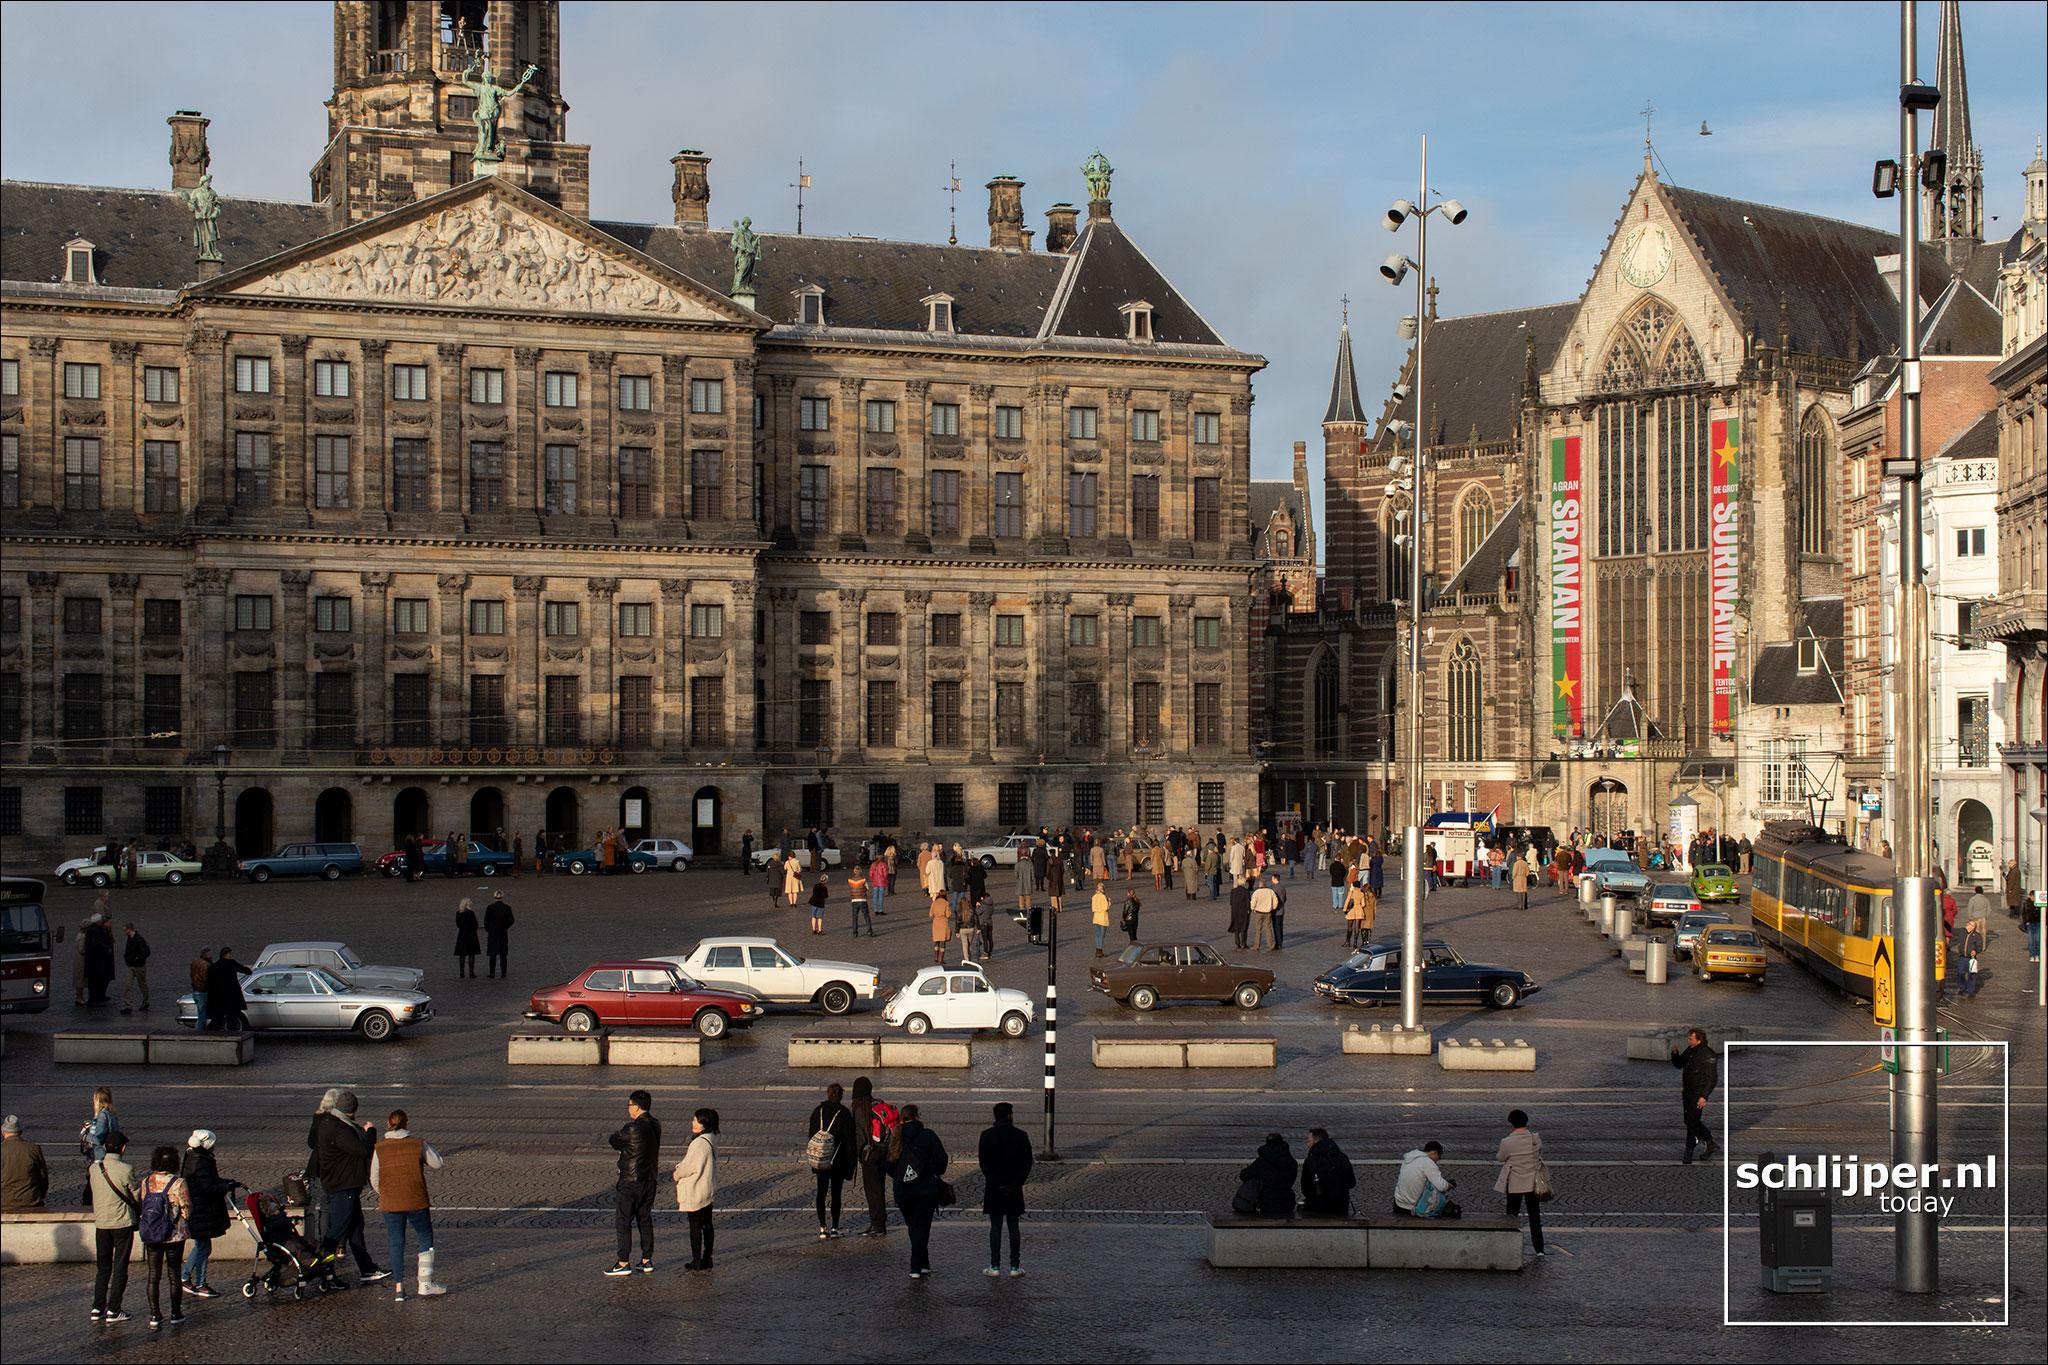 The Netherlands, Amsterdam, 3 november 2019